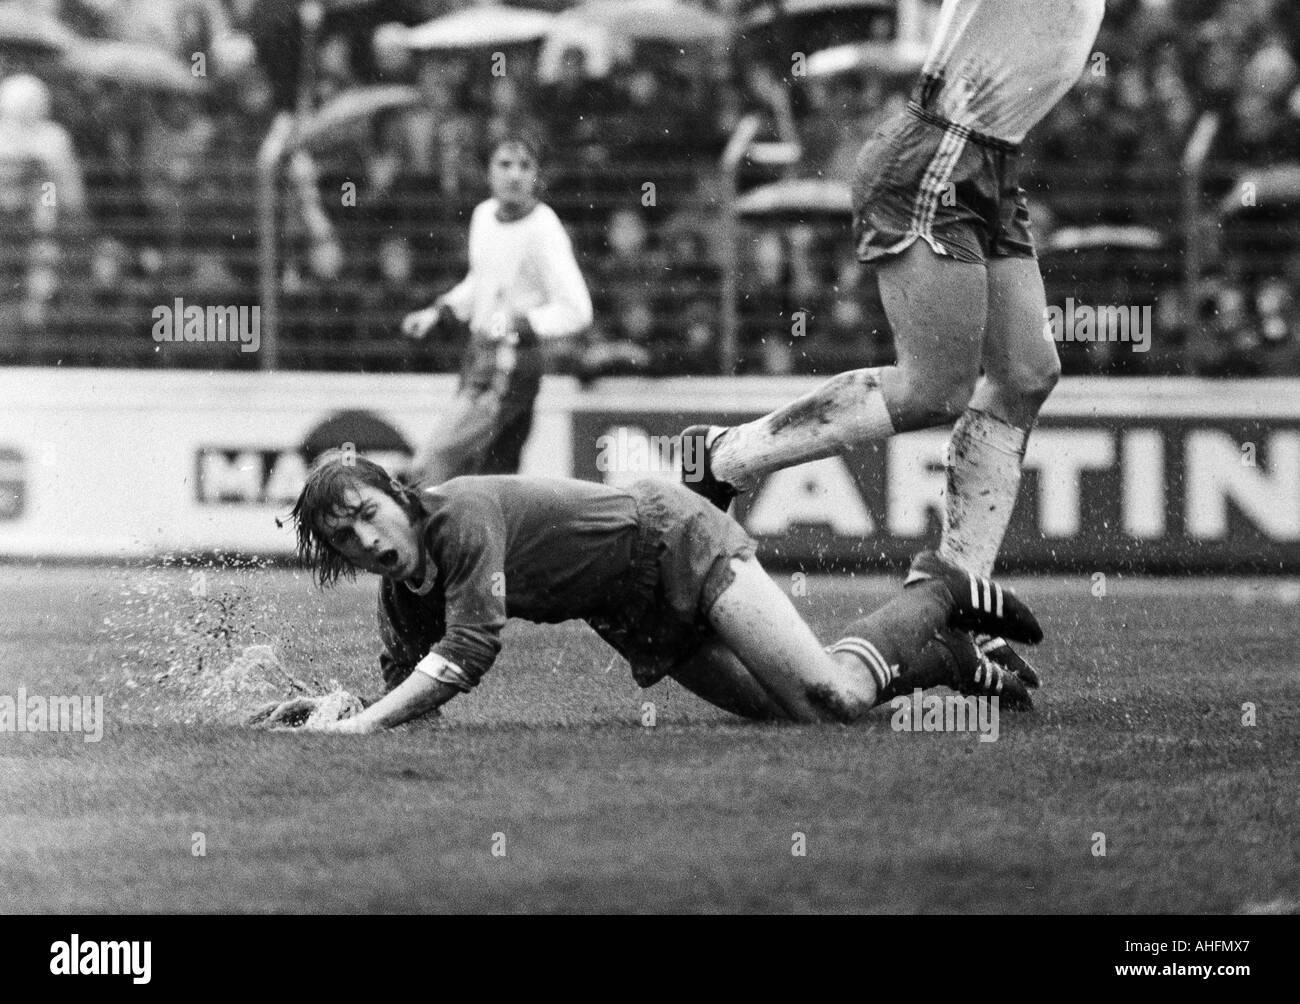 football, Bundesliga, 1971/1972, Niederrhein Stadium in Oberhausen, Rot-Weiss Oberhausen versus FC Schalke 04 2:3, rainy weather, game in heavy rain, scene of the match, Klaus Fischer (S04) aground - Stock Image